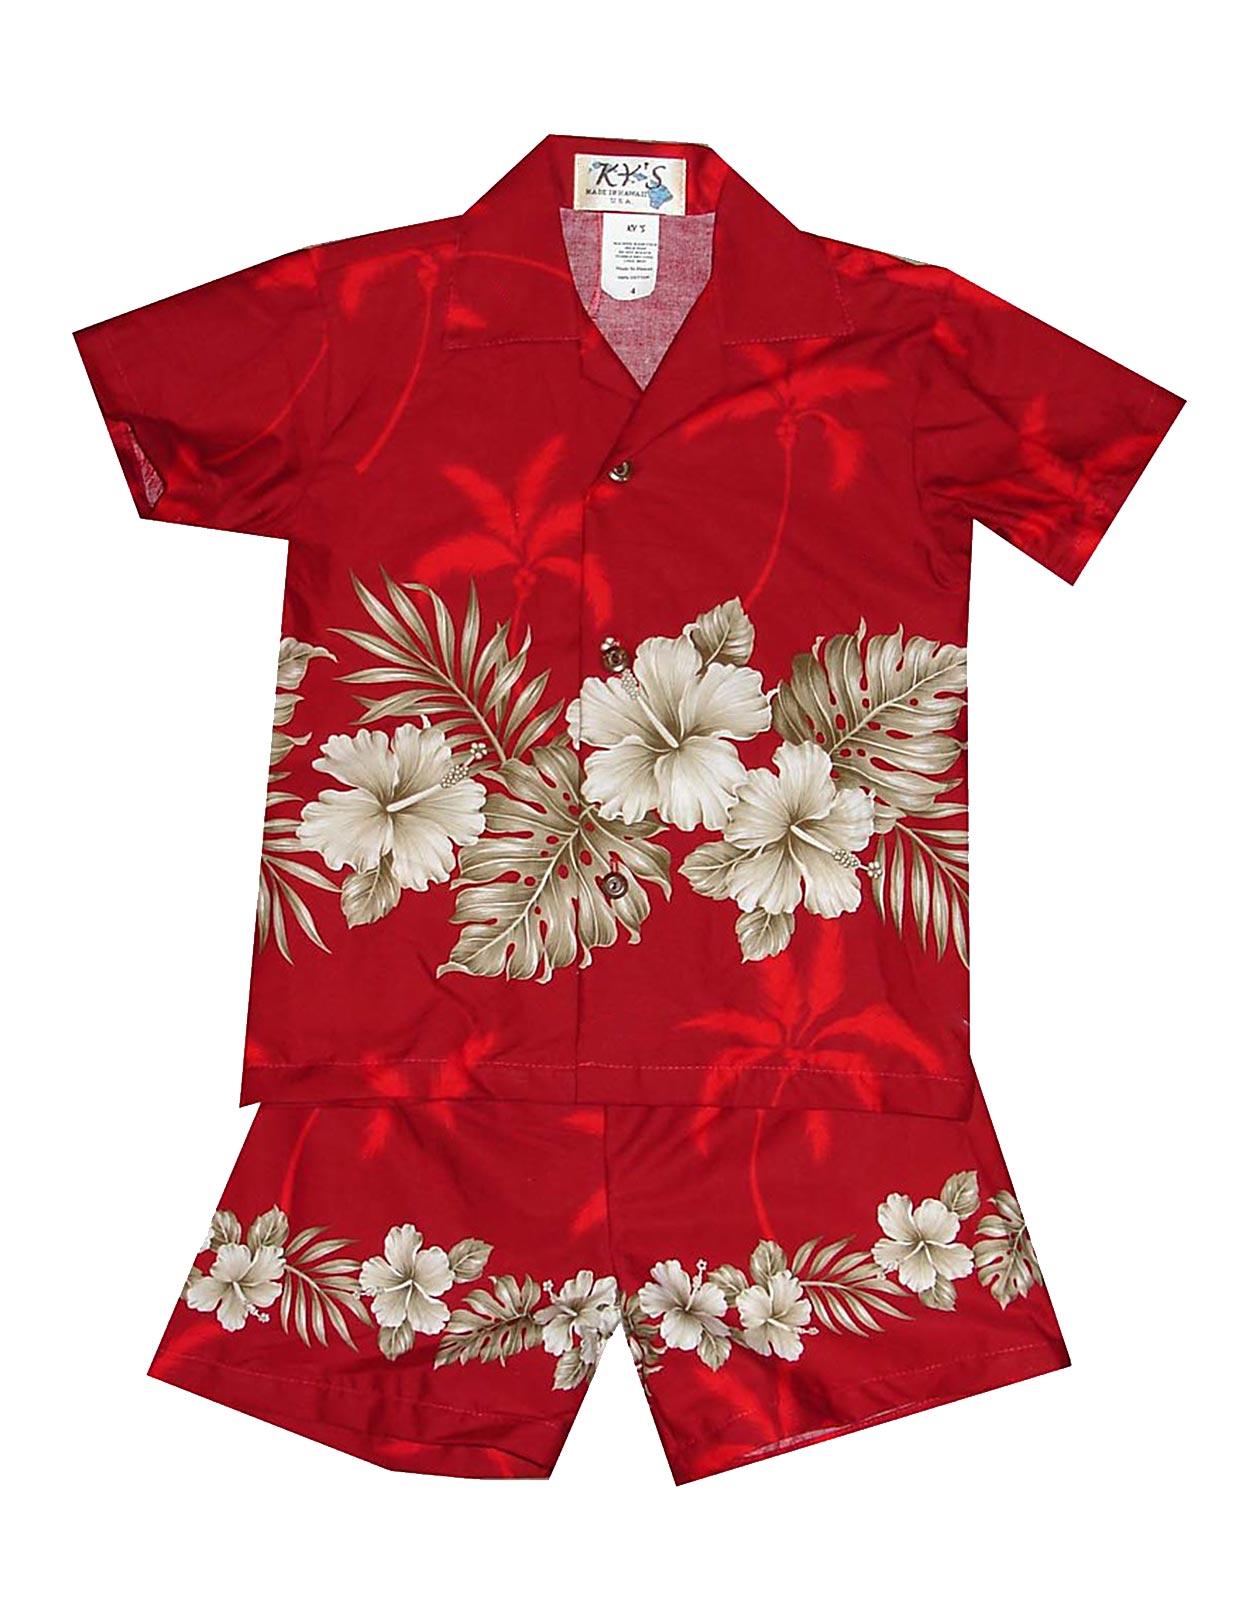 Hawaii clothes stores